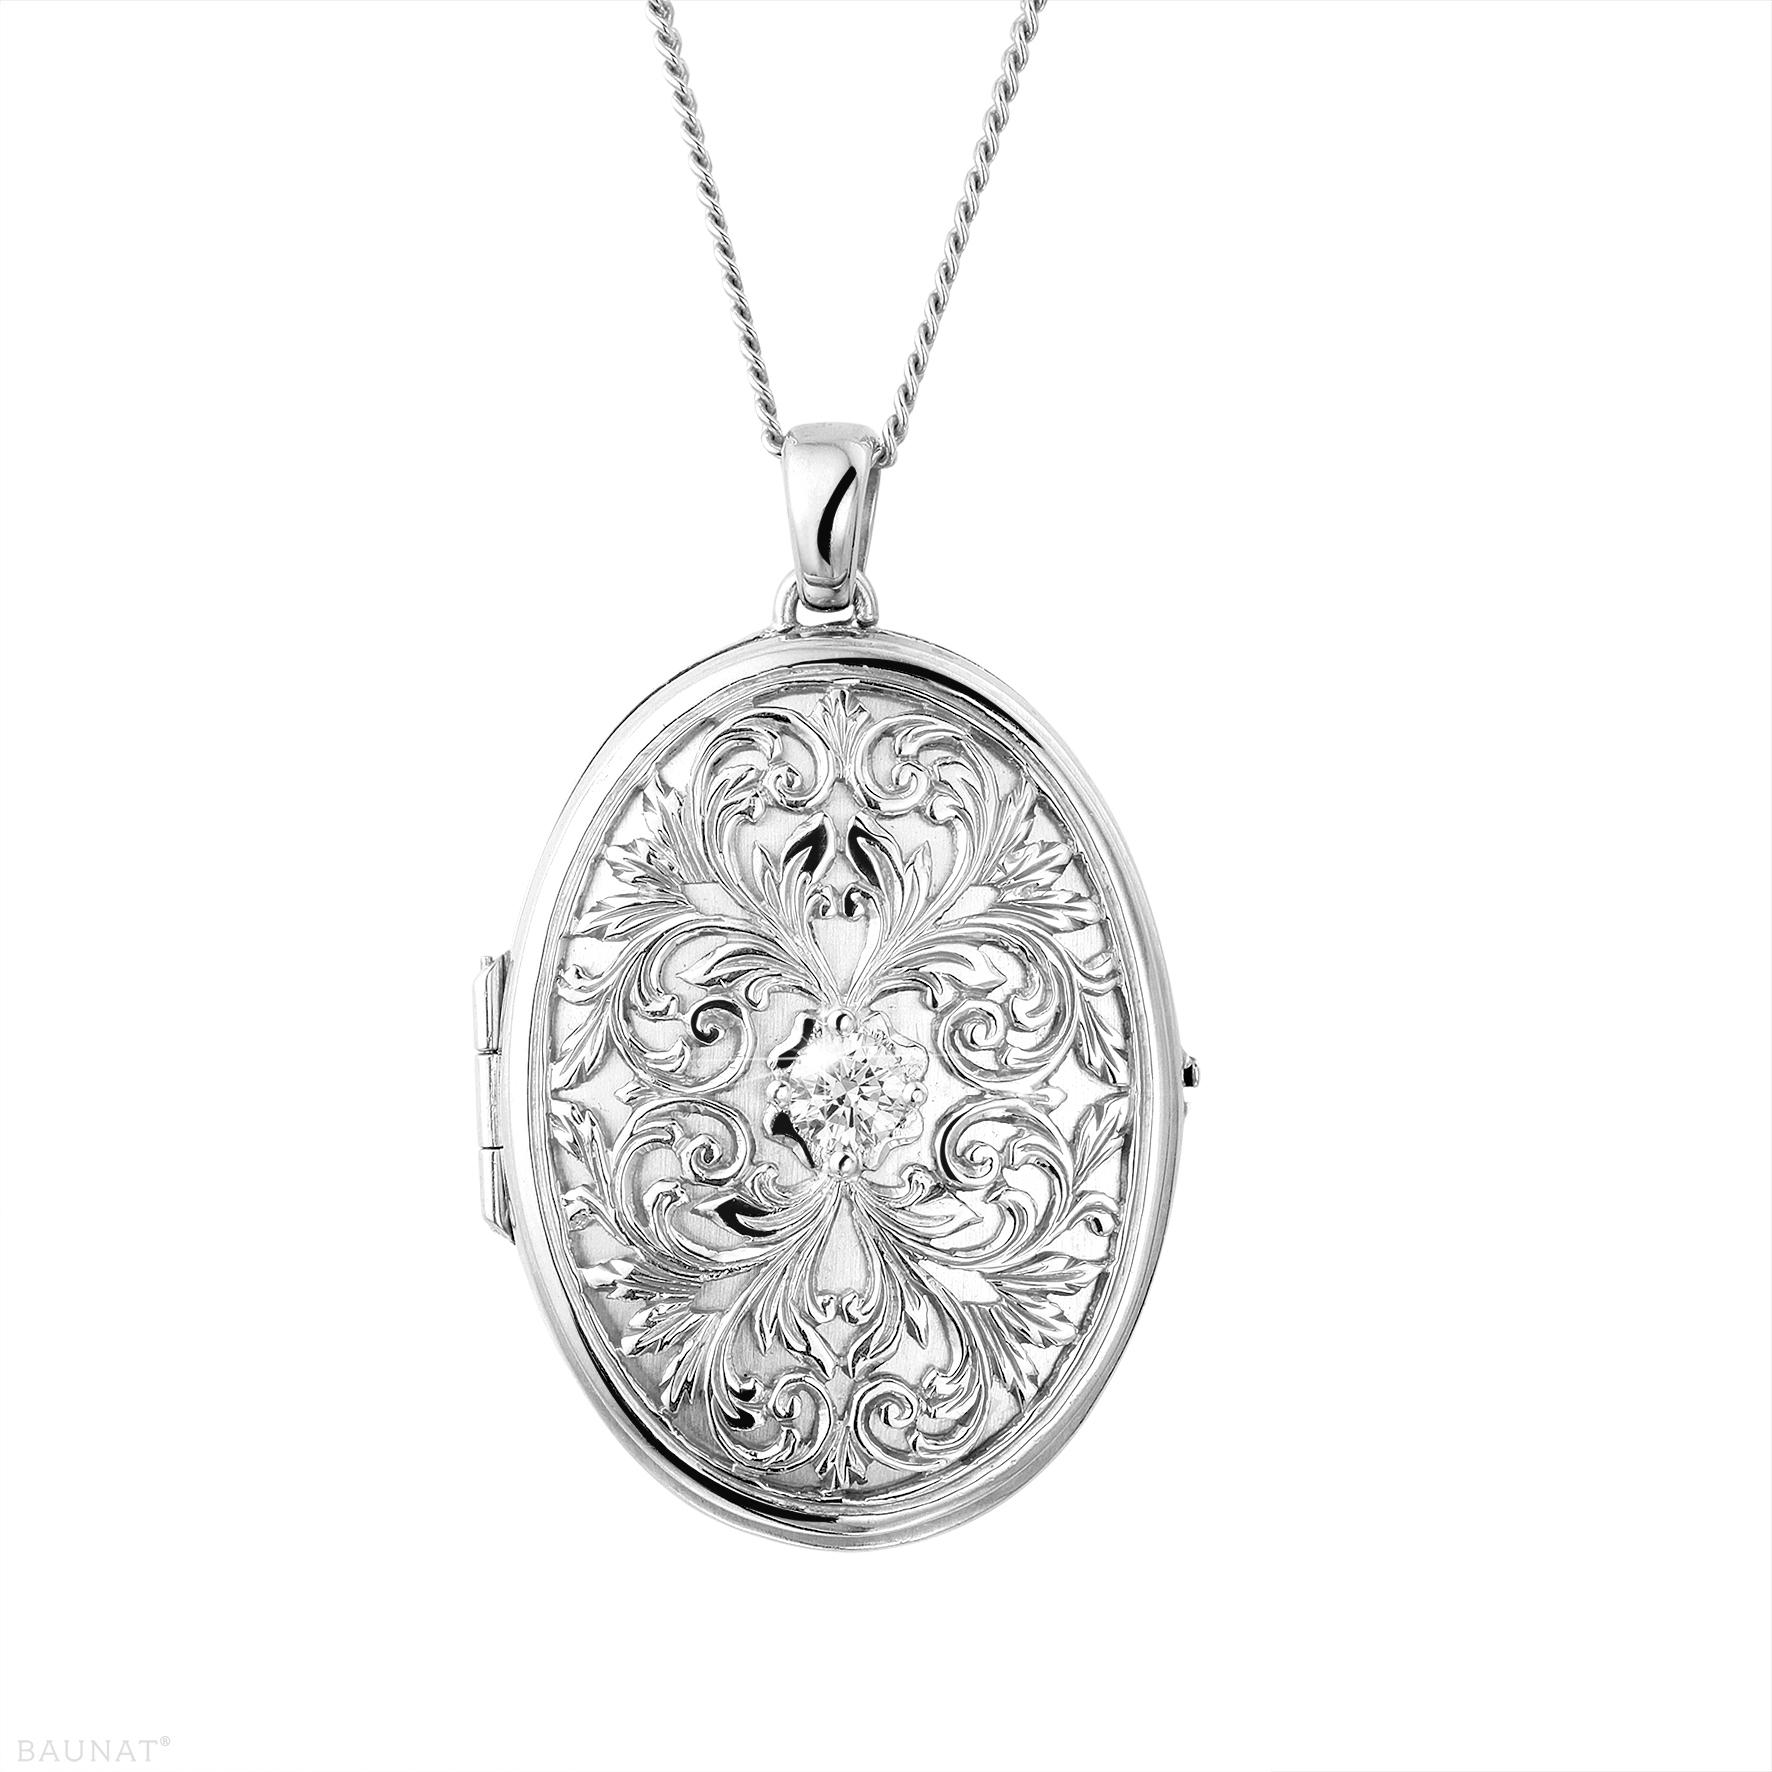 040 Karat Diamant Design Medaillon aus Weigold  BAUNAT